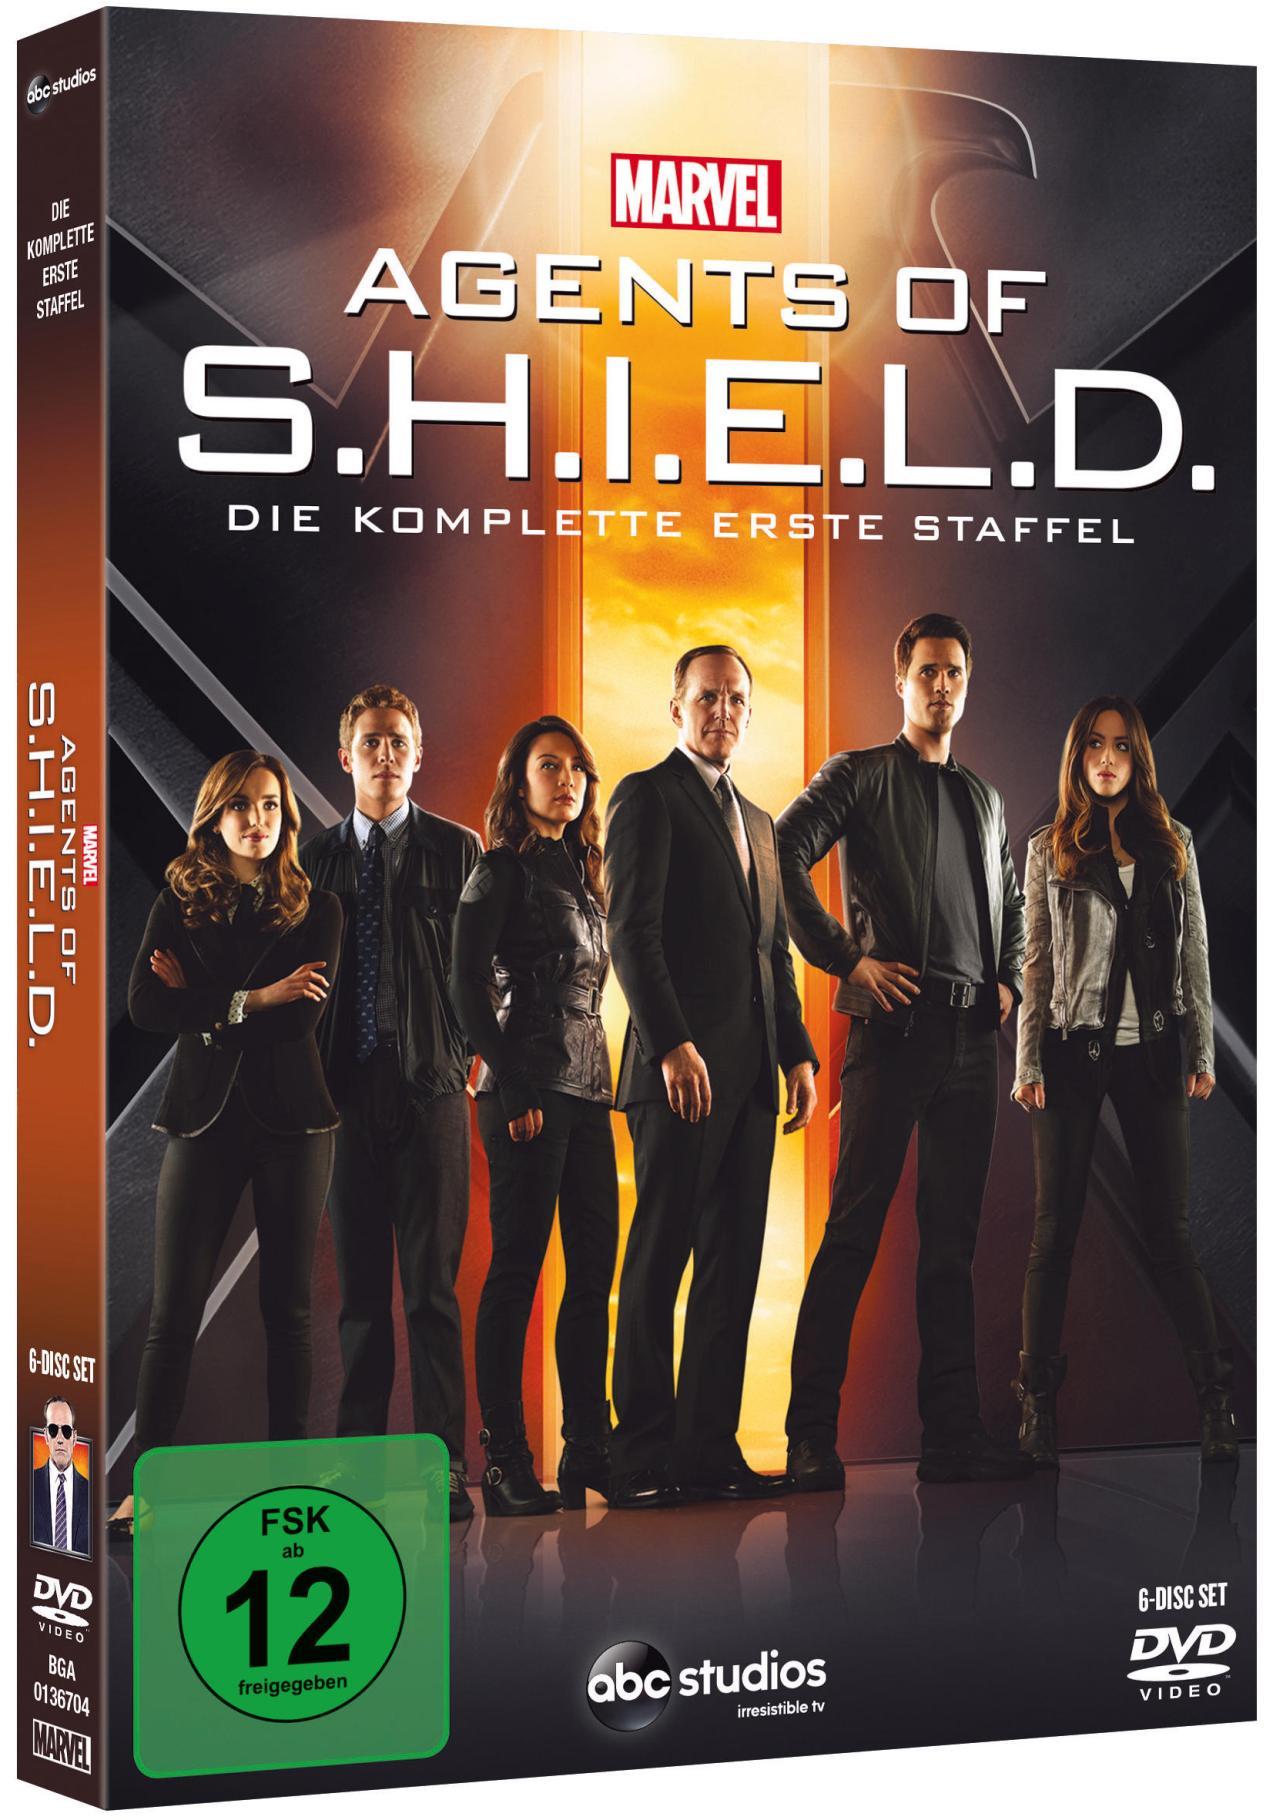 MarvelS Agents Of Shield Staffel 3 Deutsch